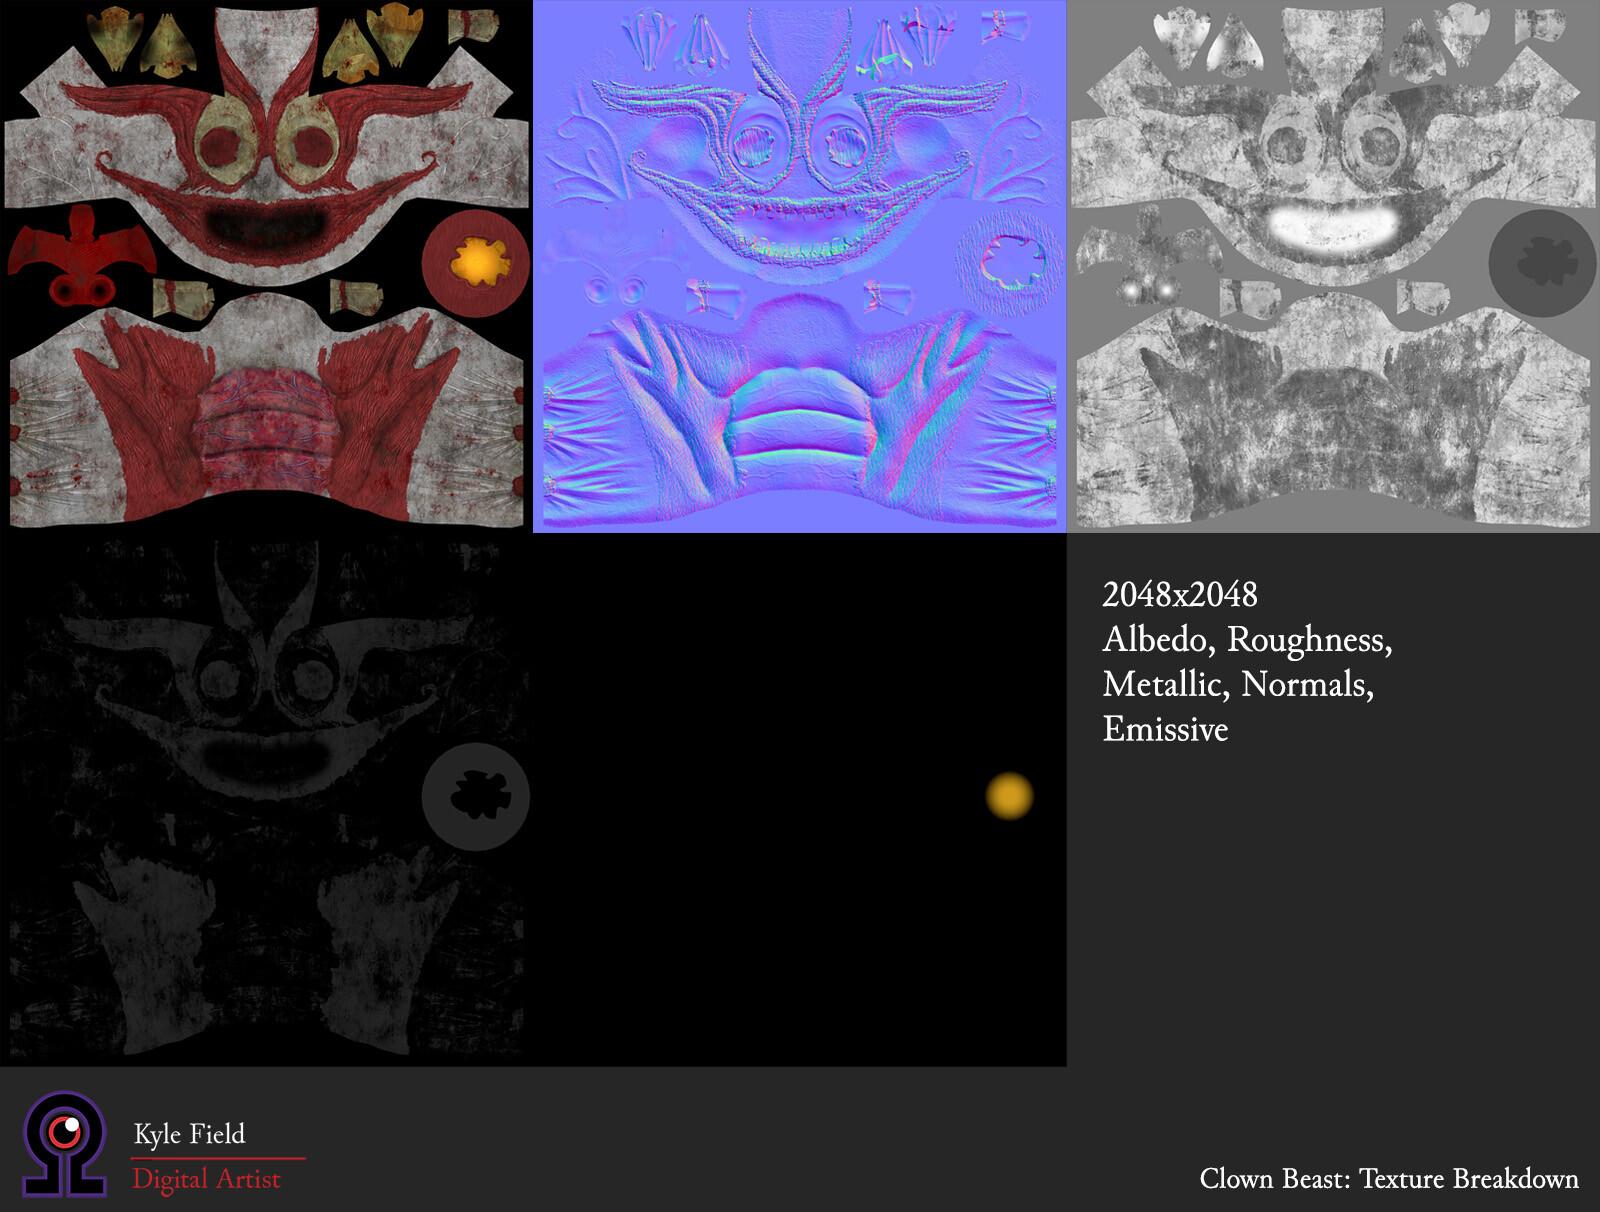 Kyle field 5 clownbeast texturebreakdown web